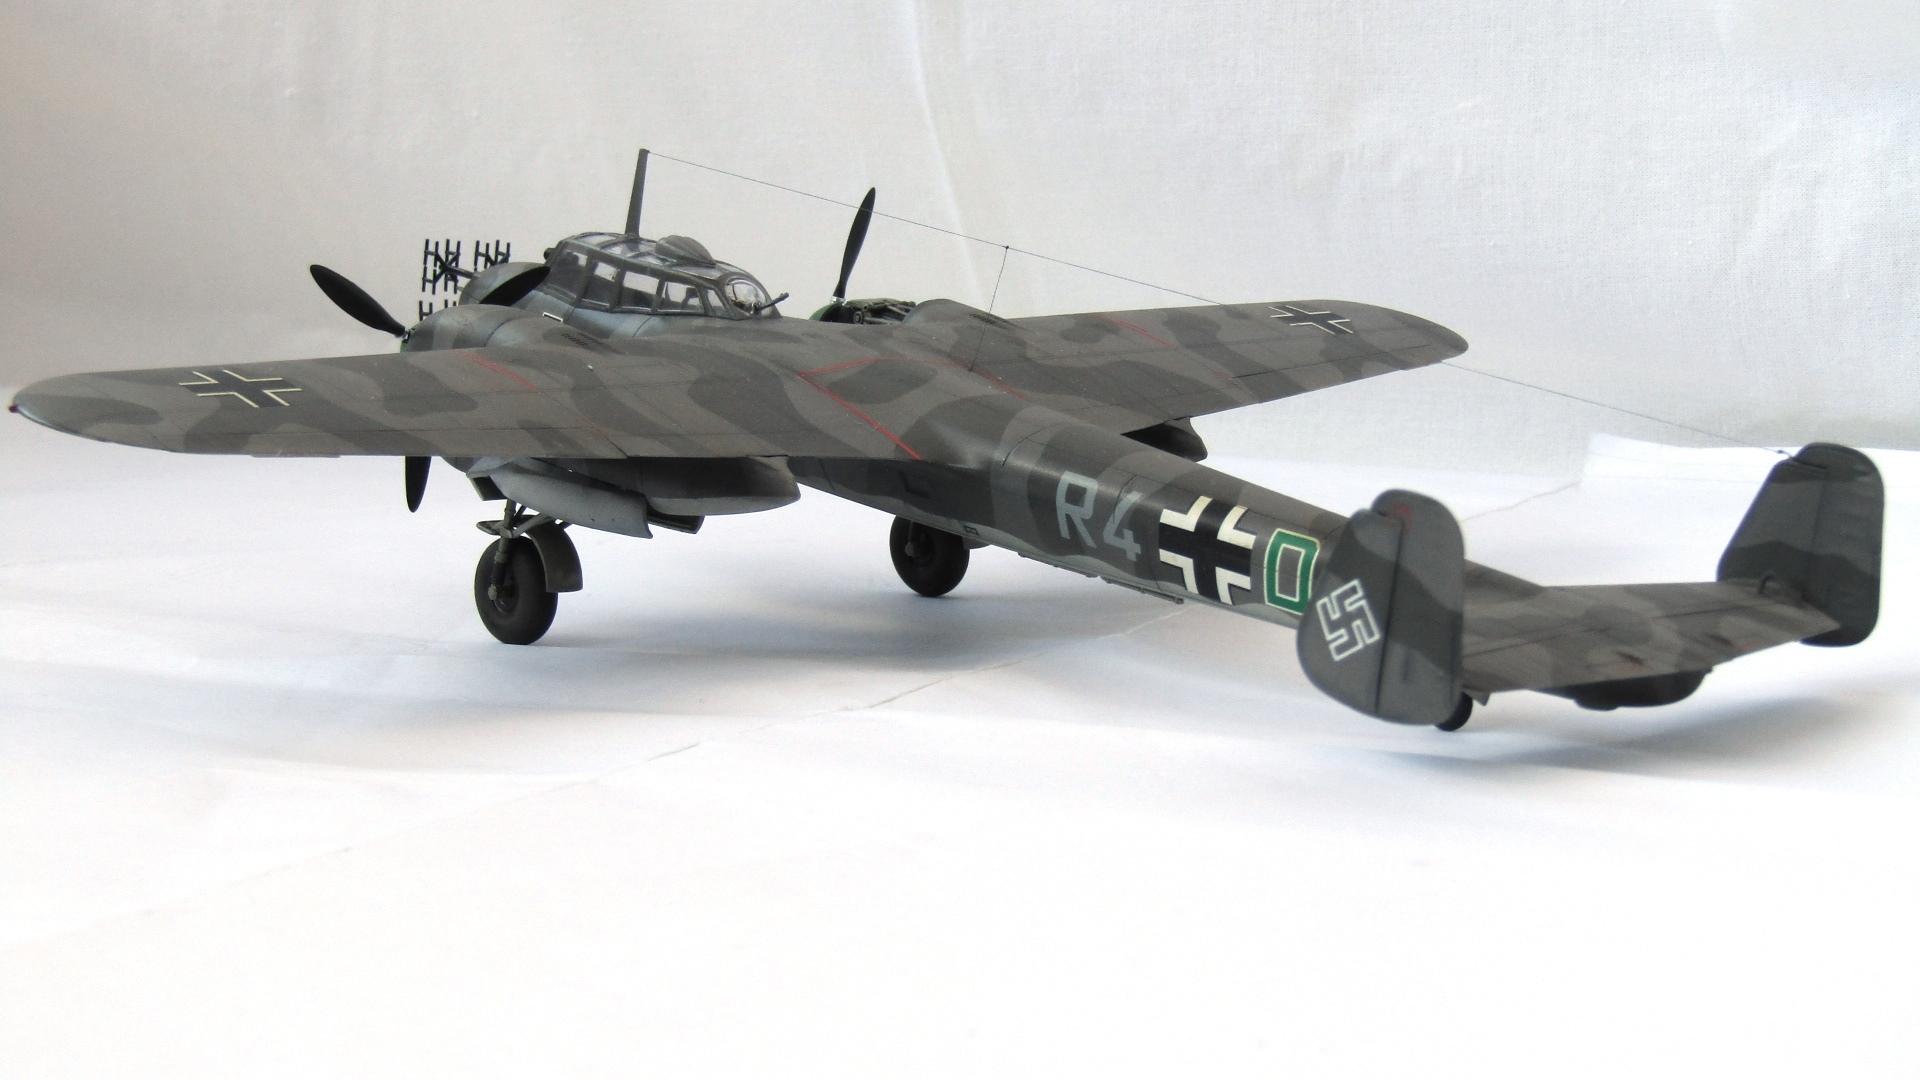 Do-215 B-5 1/72 (ICM) NW09diFB7yU